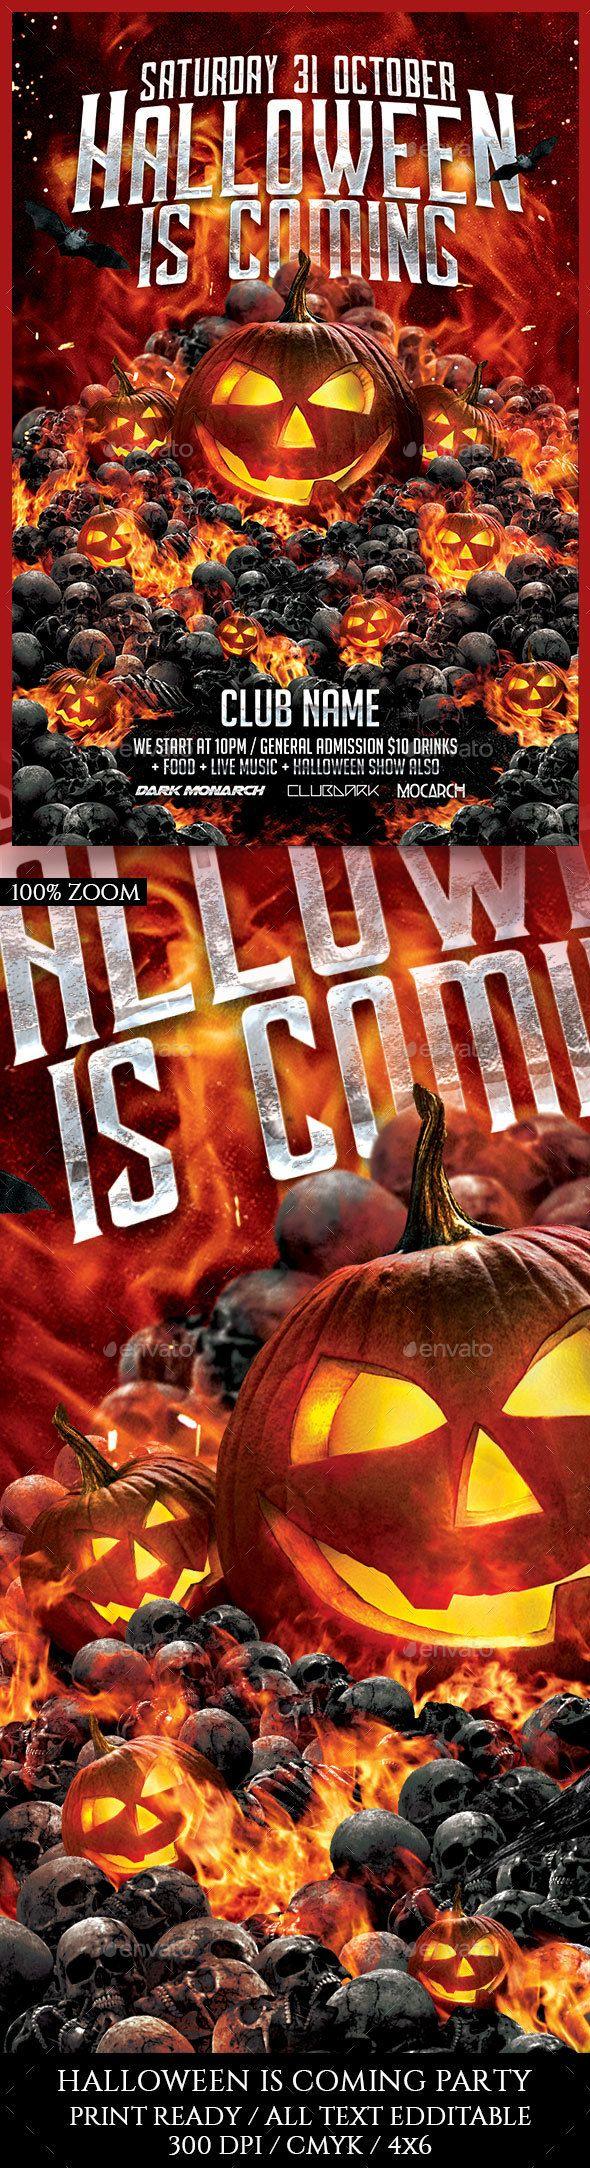 Halloween Is Coming Flyer Template PSD. Download here: https://graphicriver.net/item/halloween-is-coming/17619390?ref=ksioks